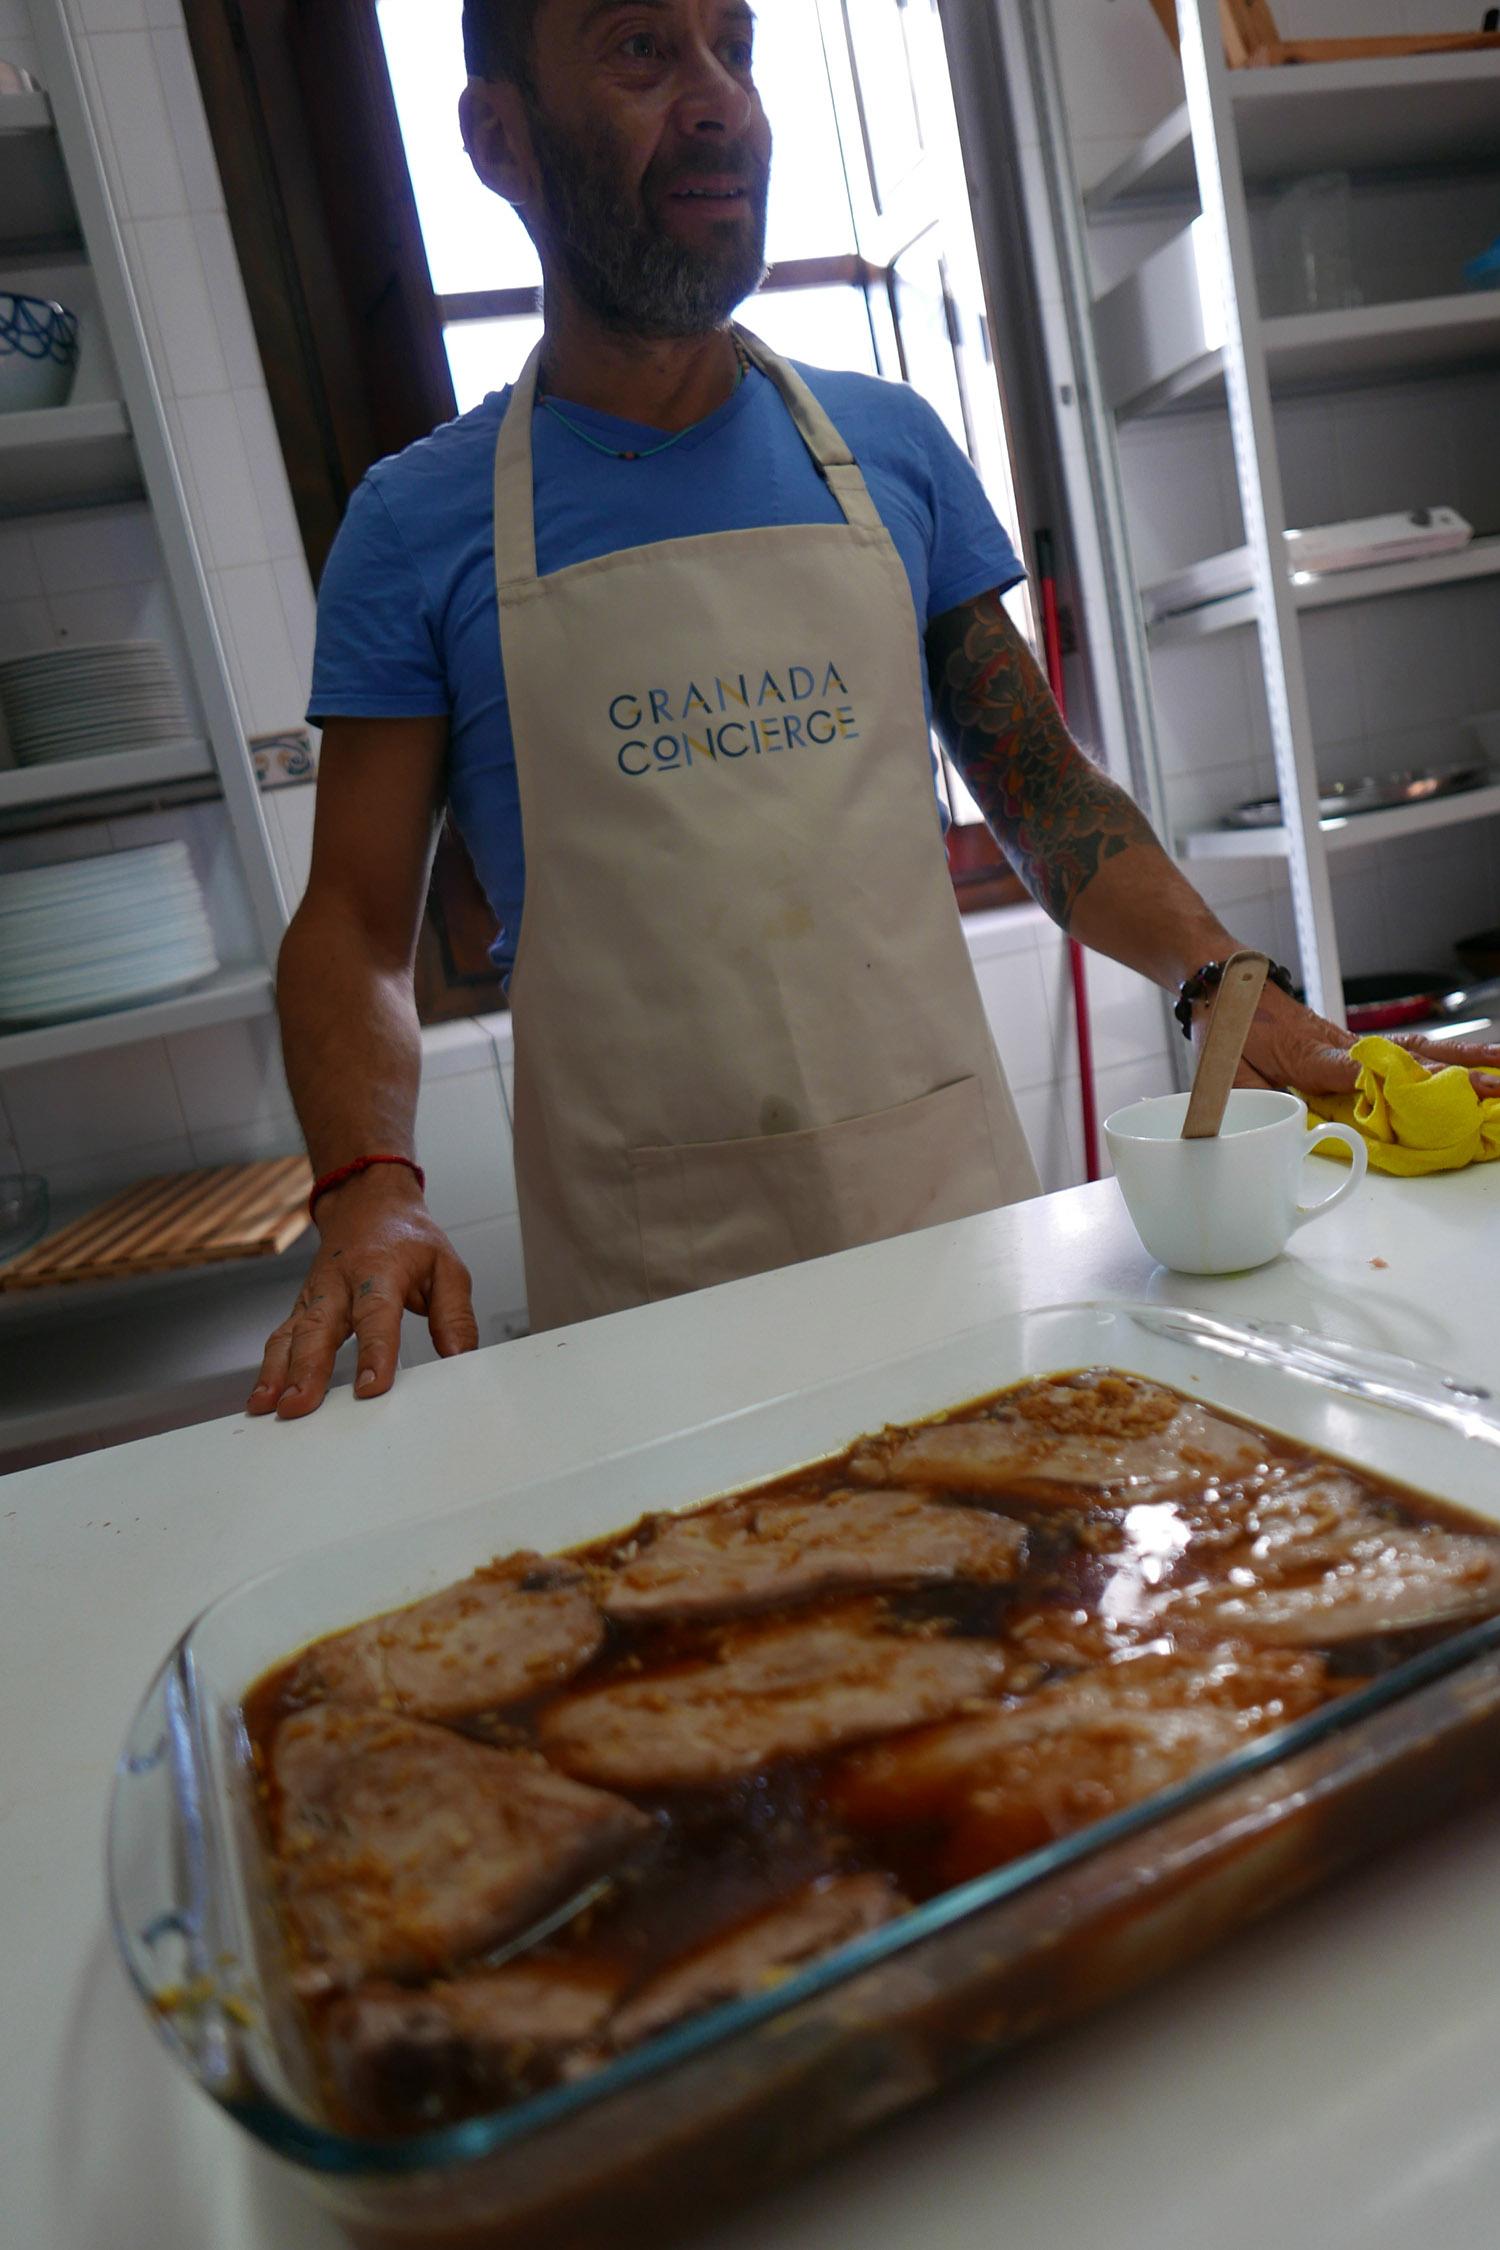 GC_Cookery_tuna tataki chef.jpg